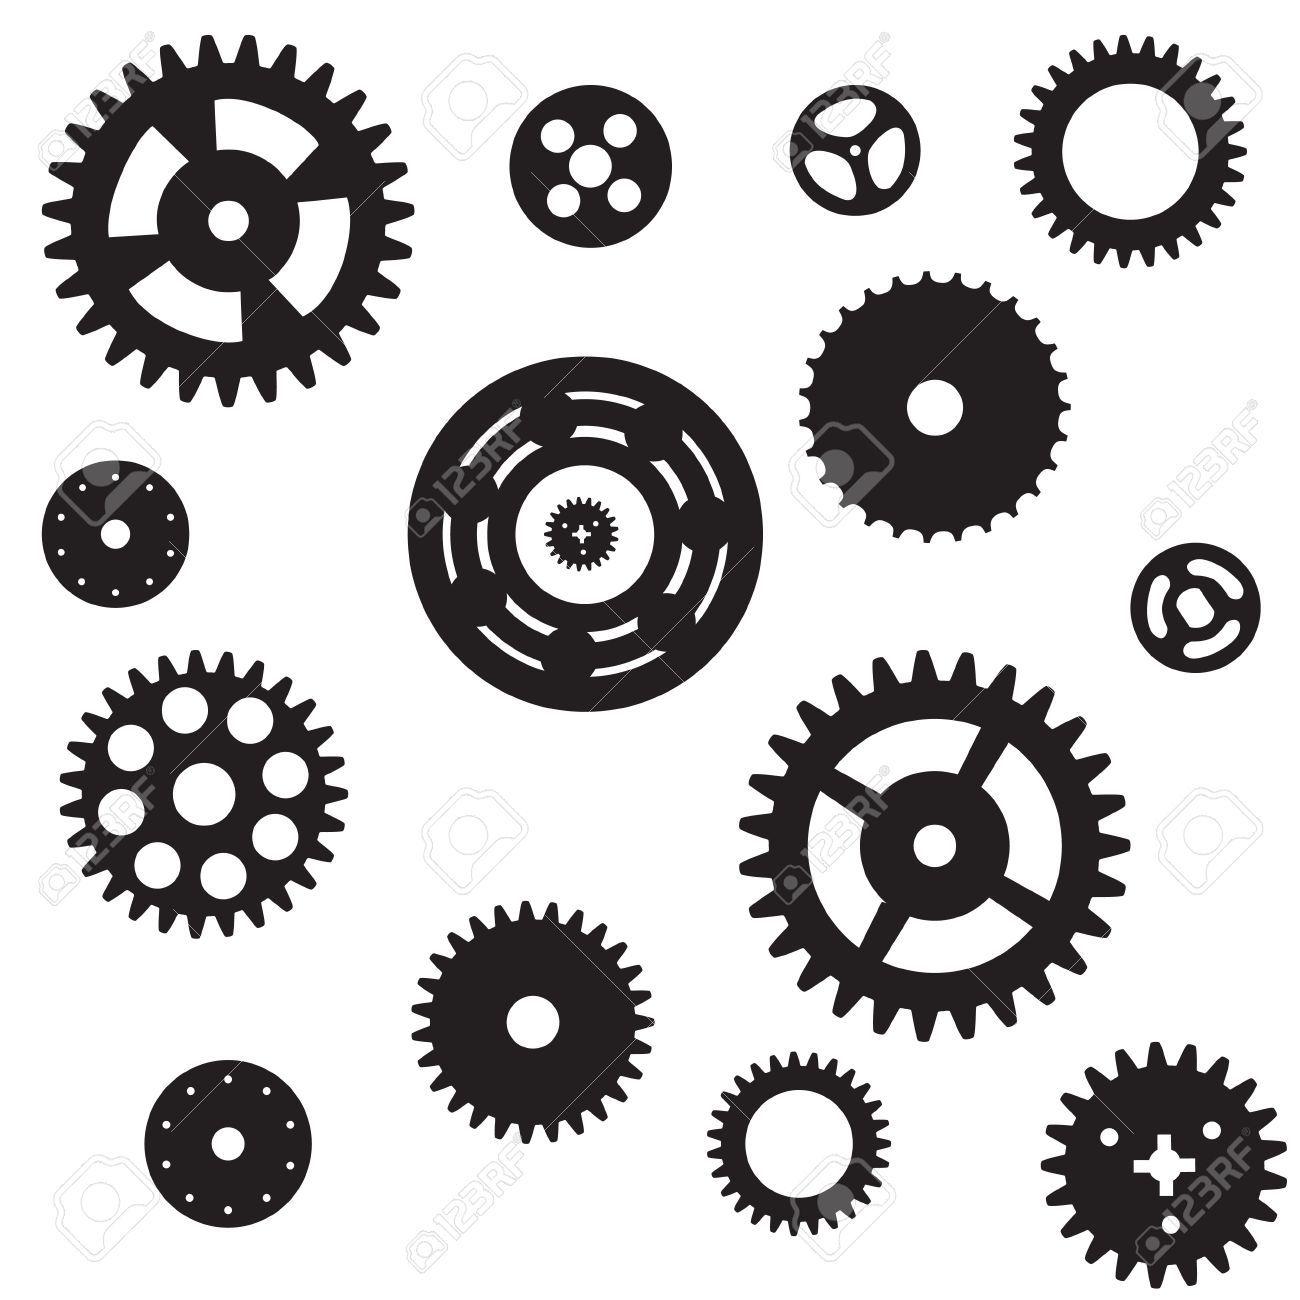 Pin on Gears, Clocks, Keys Silhouettes, Vectors, Clipart